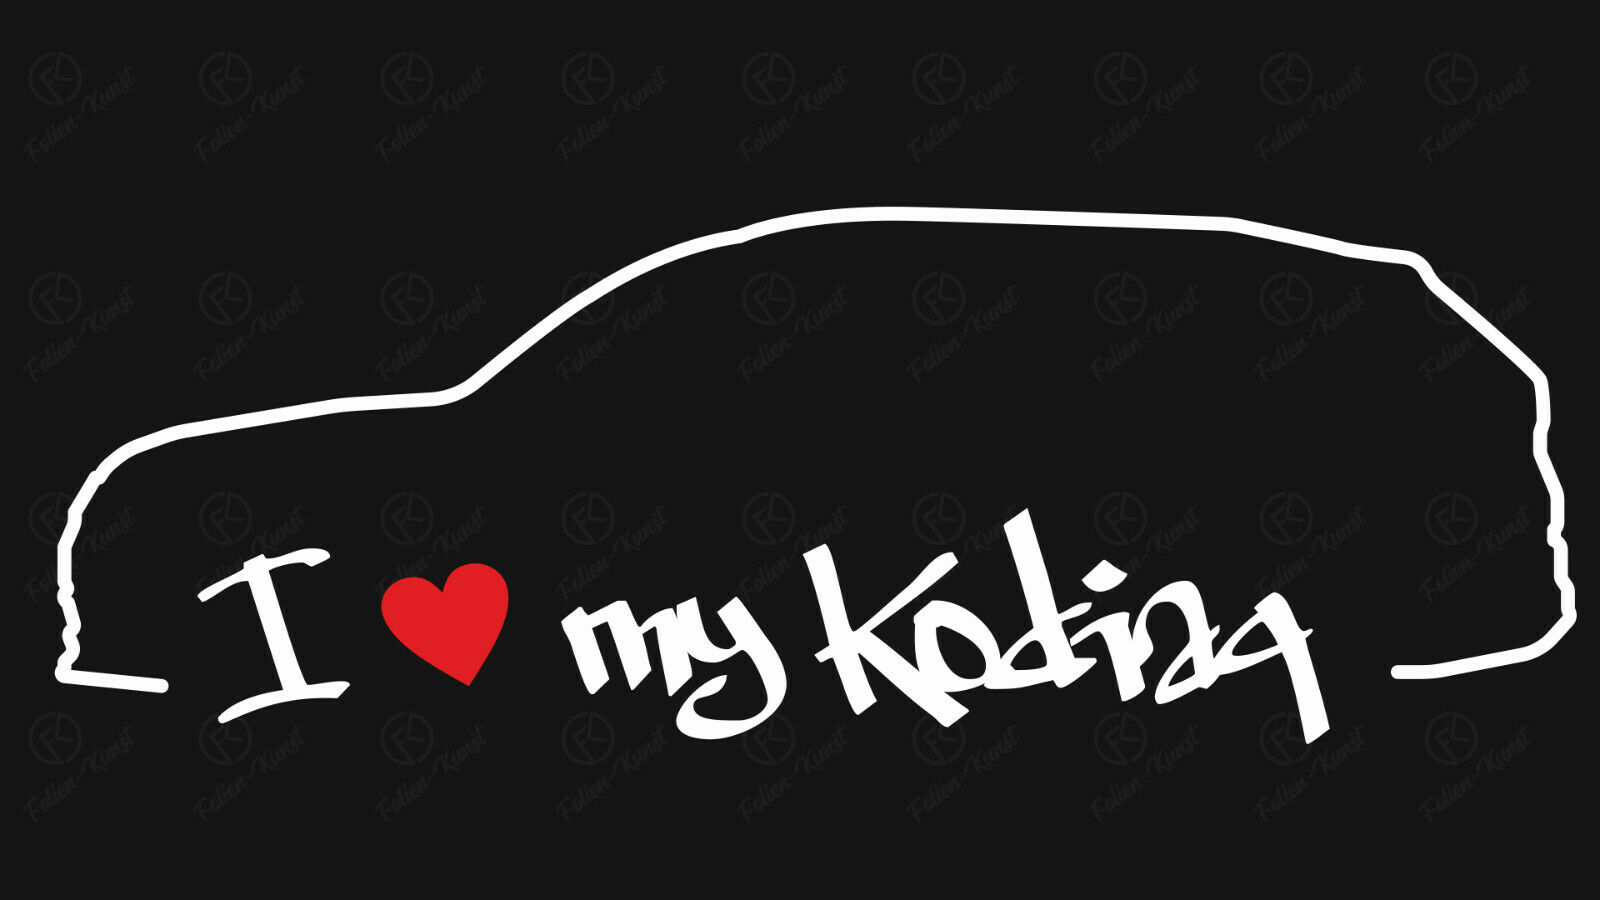 Impuls Aufkleber mit Skoda Kodiaq Silhouette Autosticker Stripes Styling Tuning